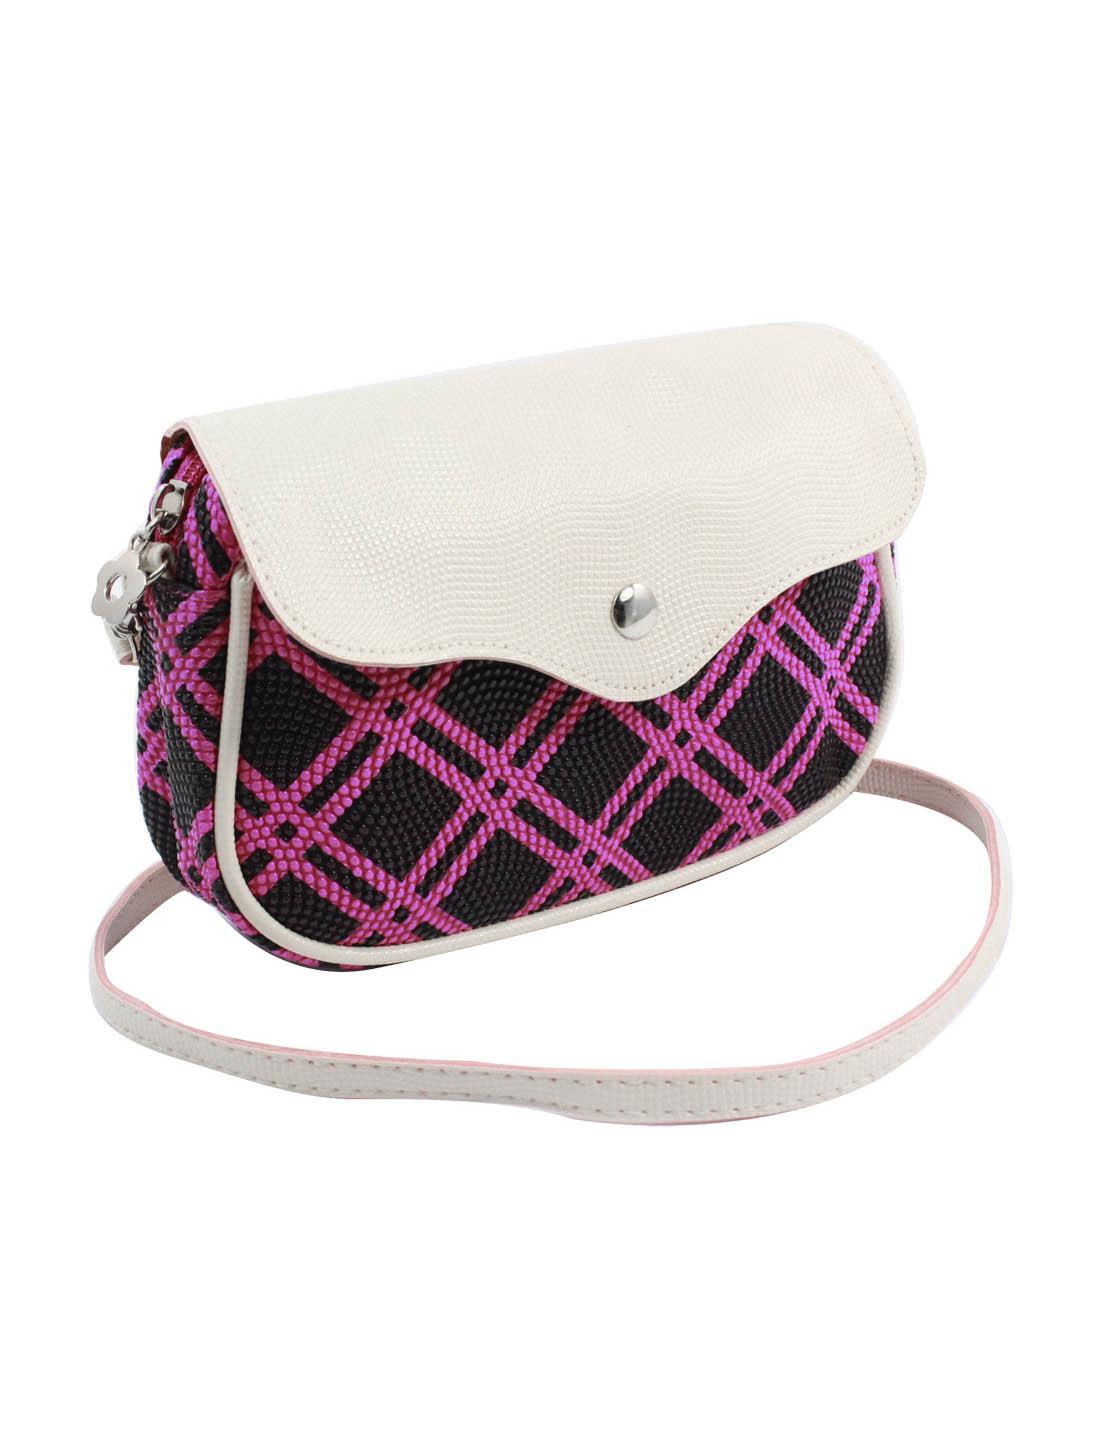 Women 2 Pockets Magnet Button Zipper Closure Plaid Pattern Faux Leather Wallet Purse Bag Black Fuchsia w Strap